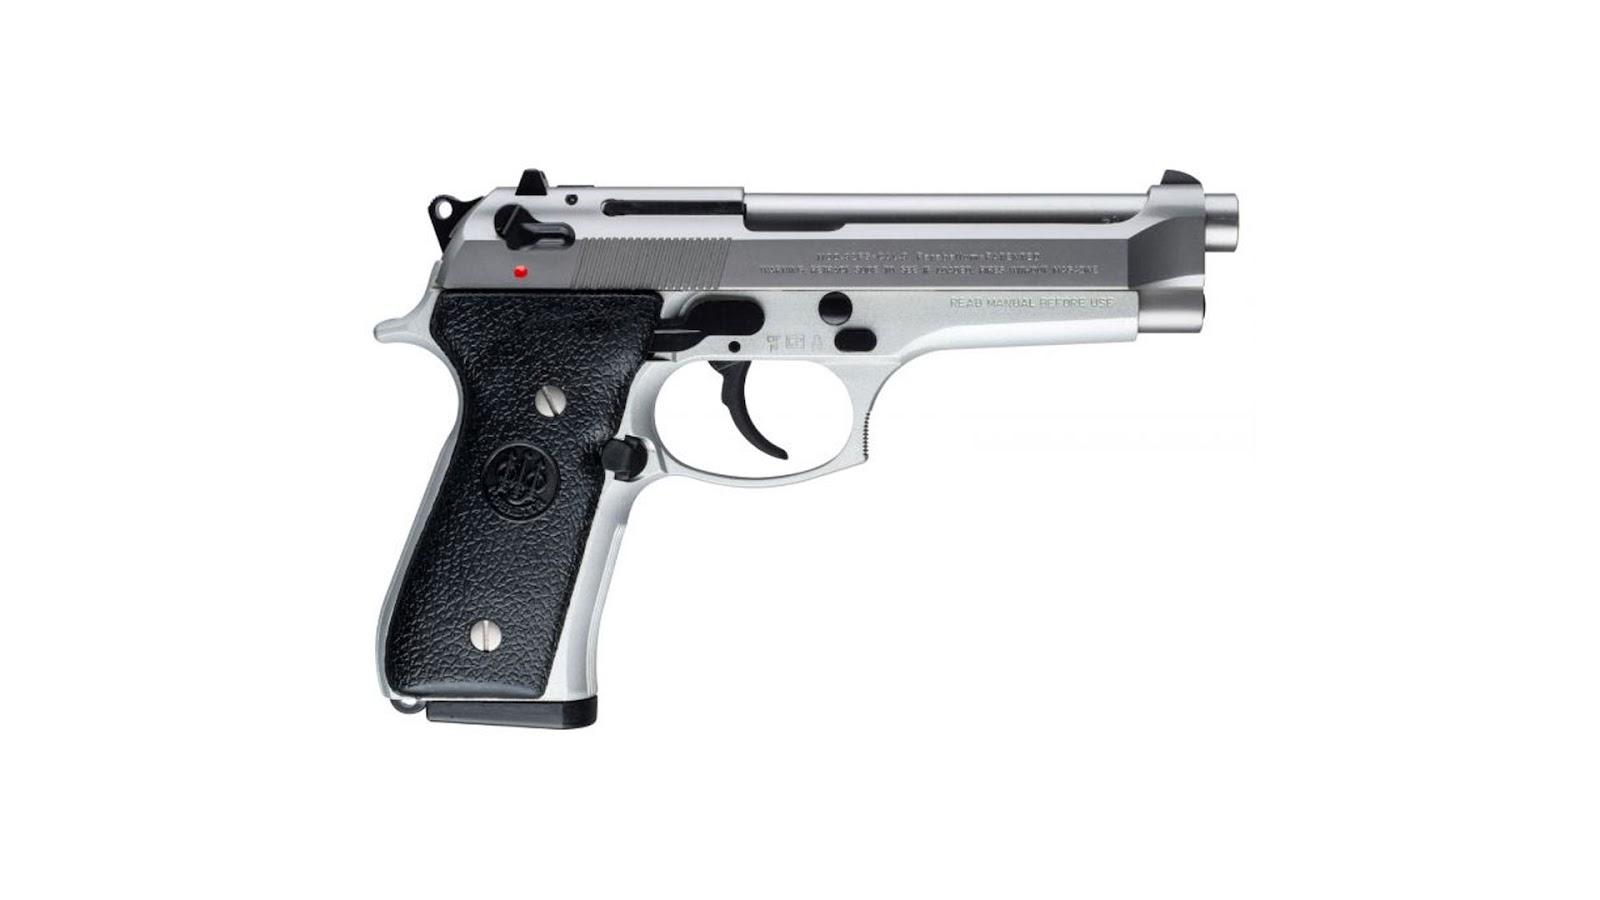 Beretta 92 pistol